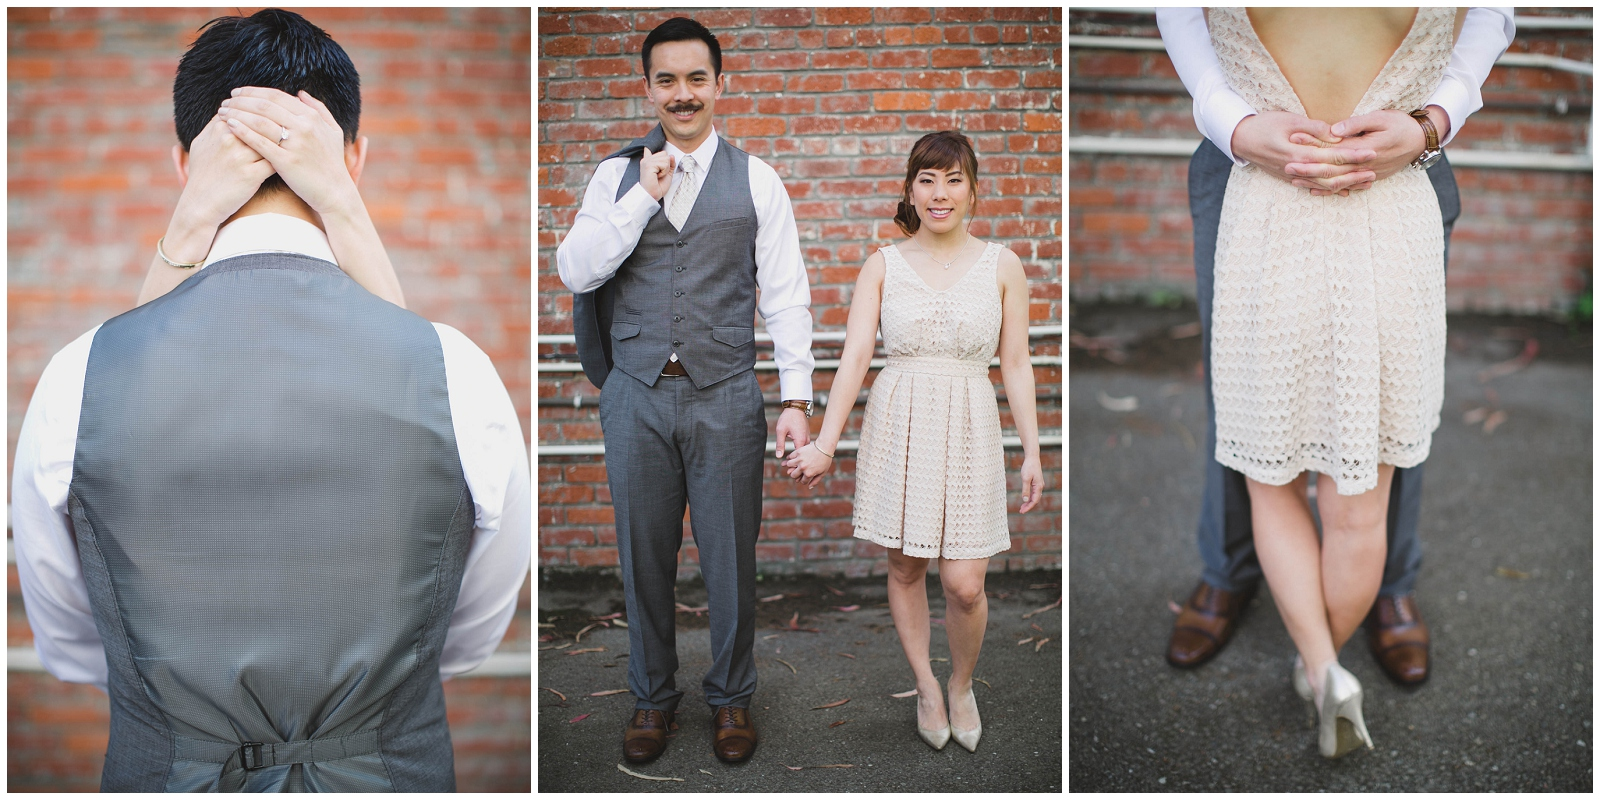 San-Francisco-Bay-Area-Wedding-Photography-Engagement-Treasure-Island-10.jpg